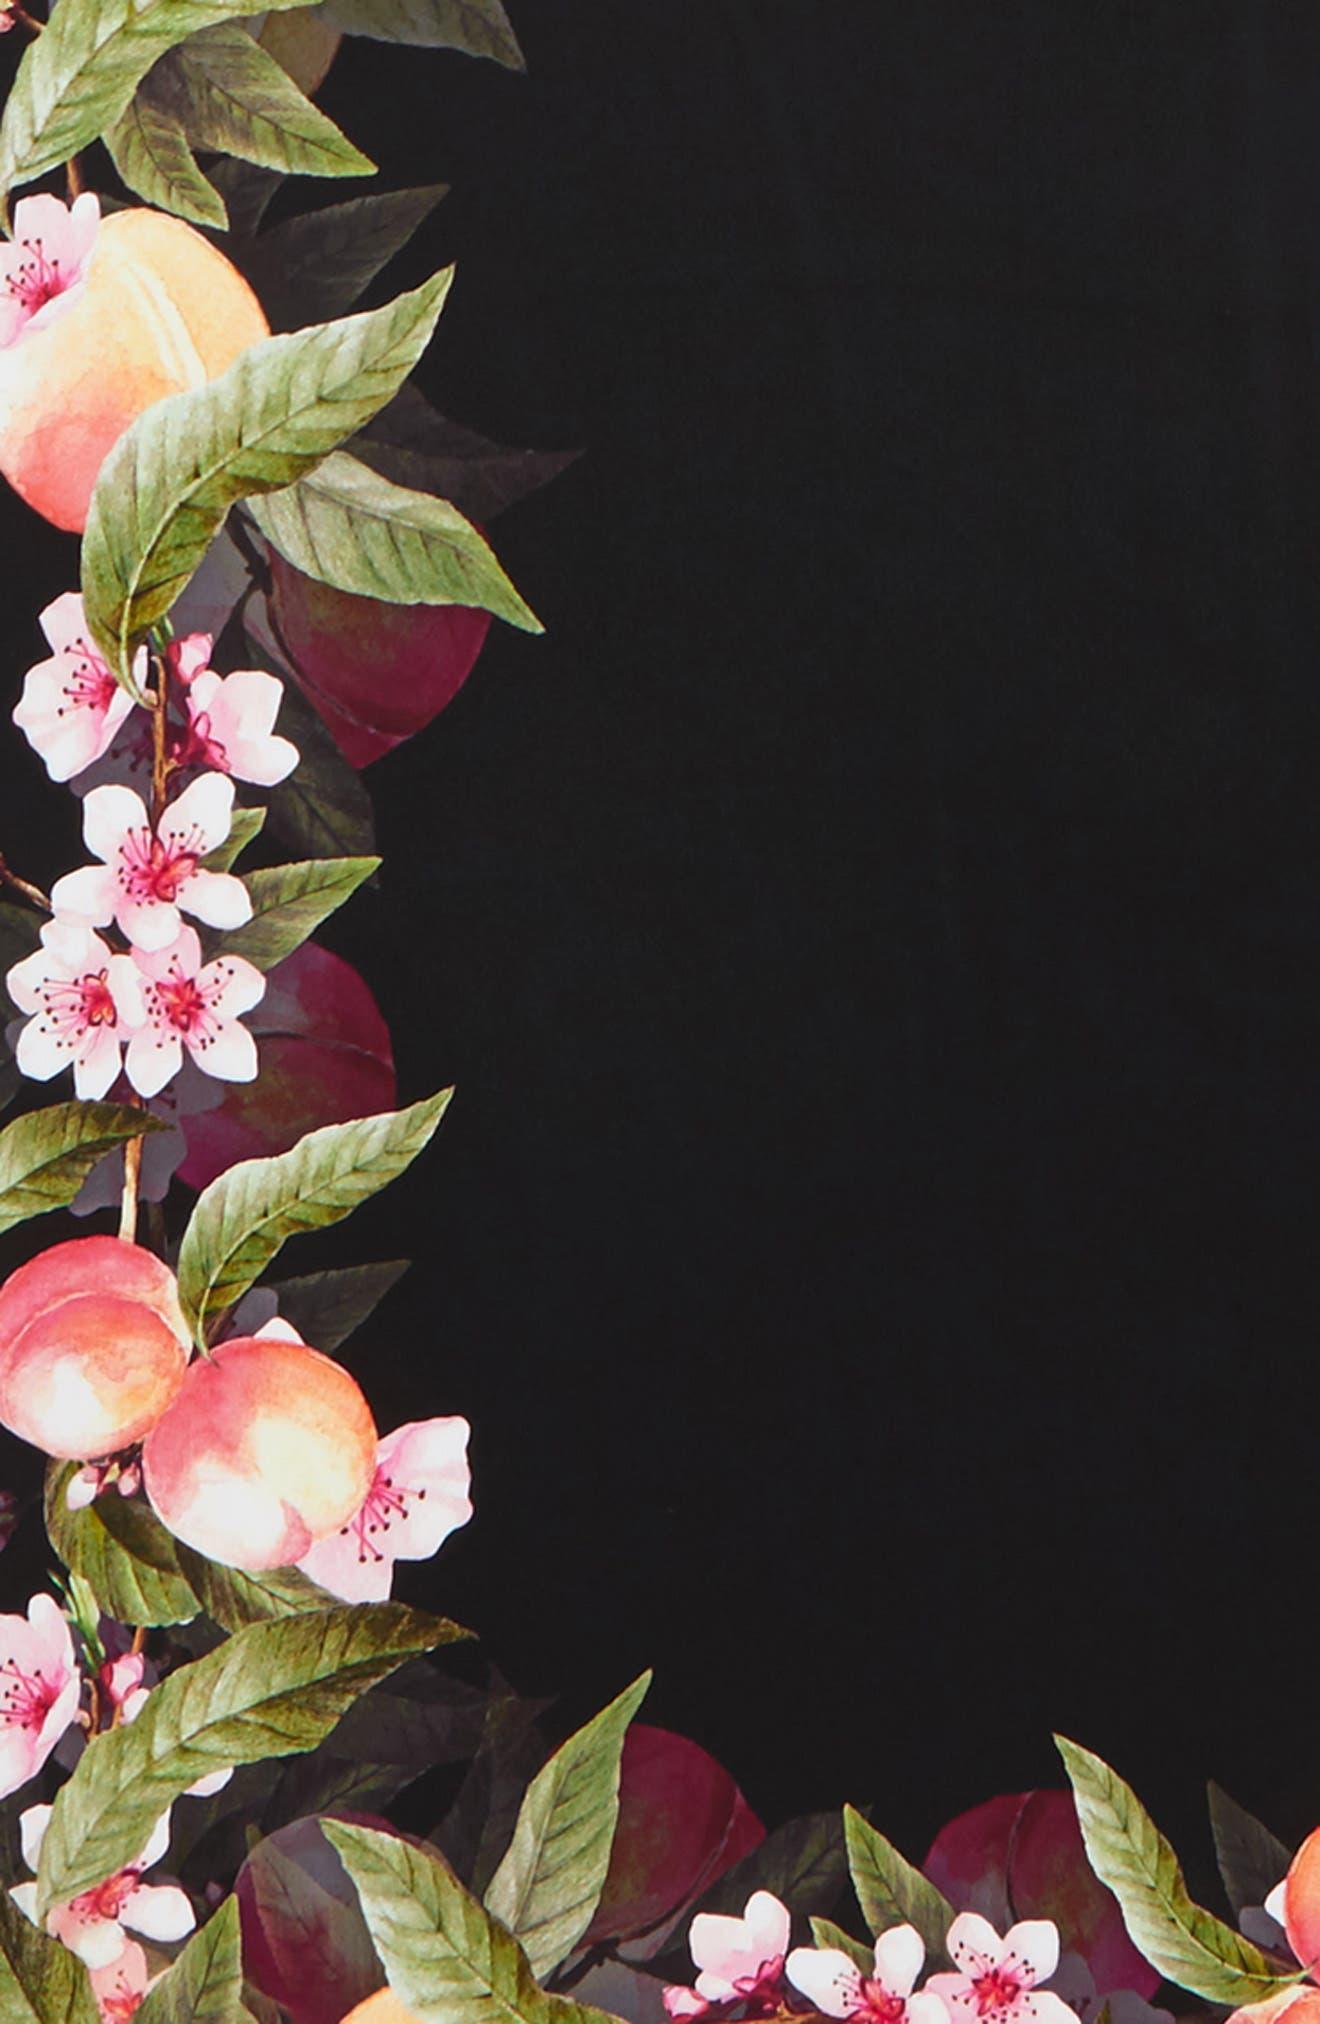 Peach Blossom Silk Scarf,                             Alternate thumbnail 4, color,                             001